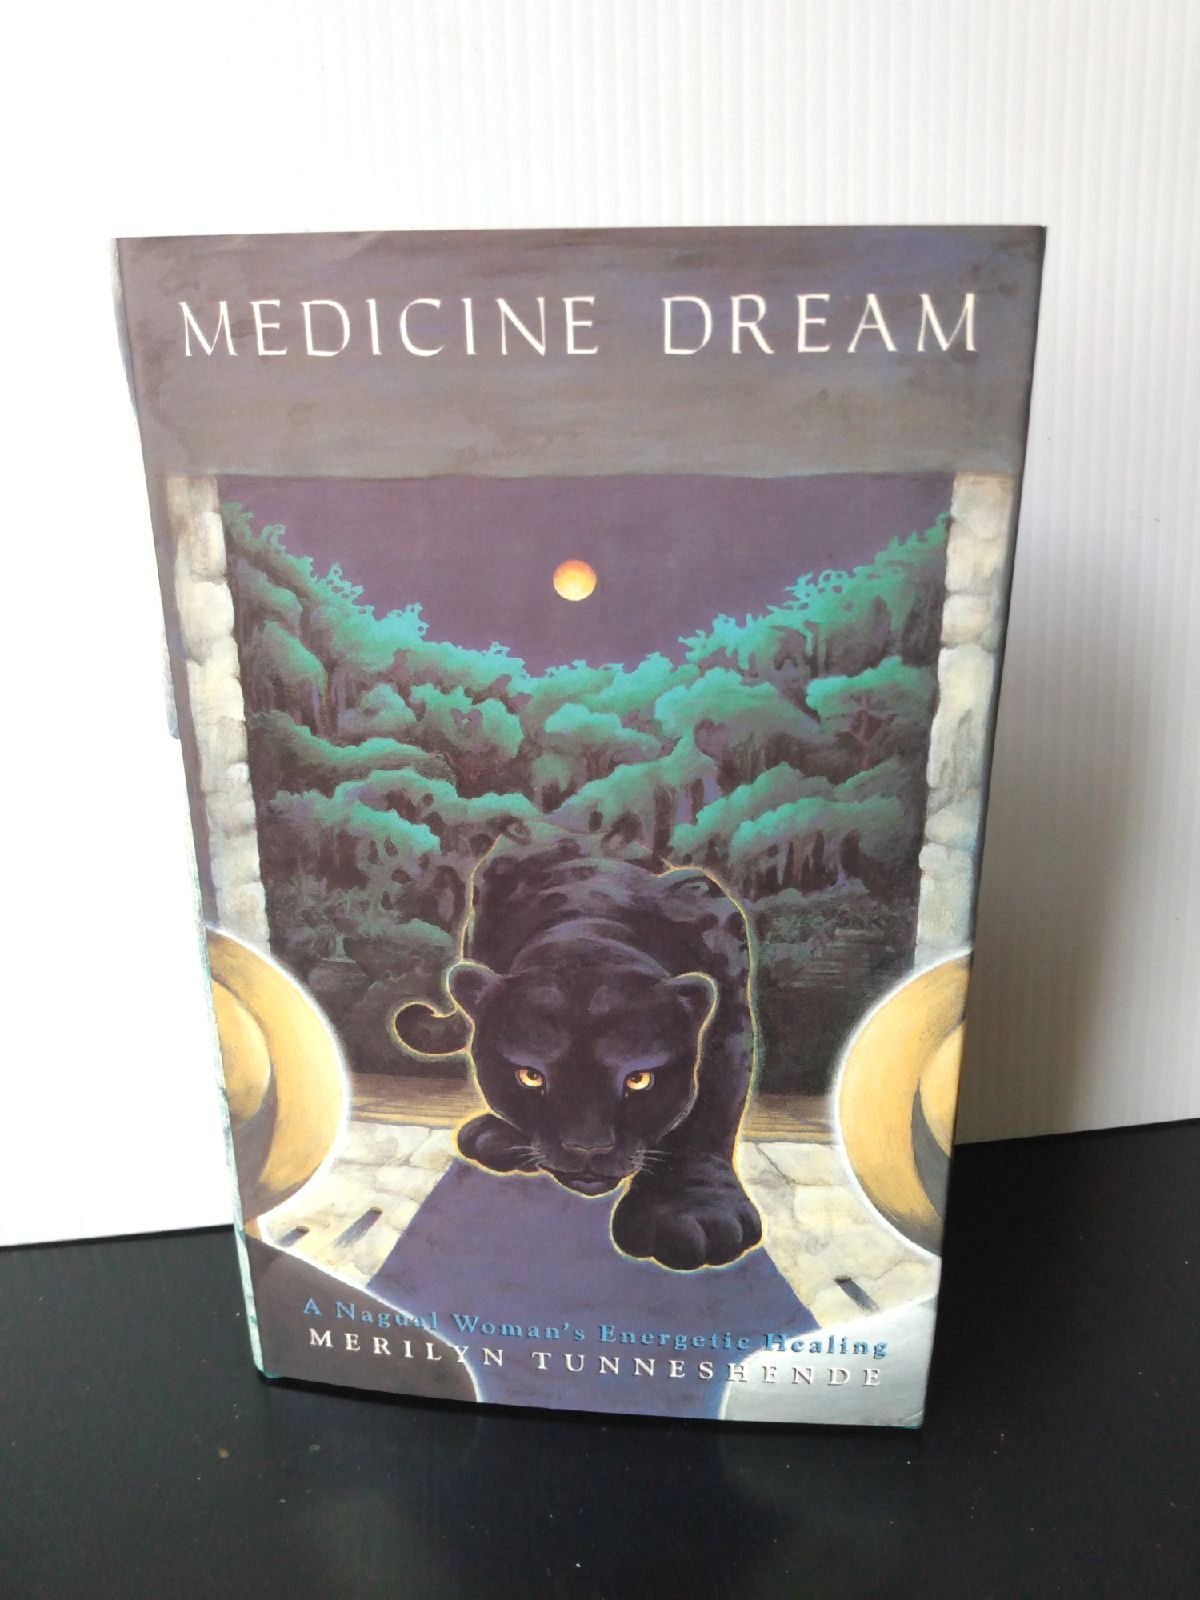 Medicine Dream a magical woman's energet